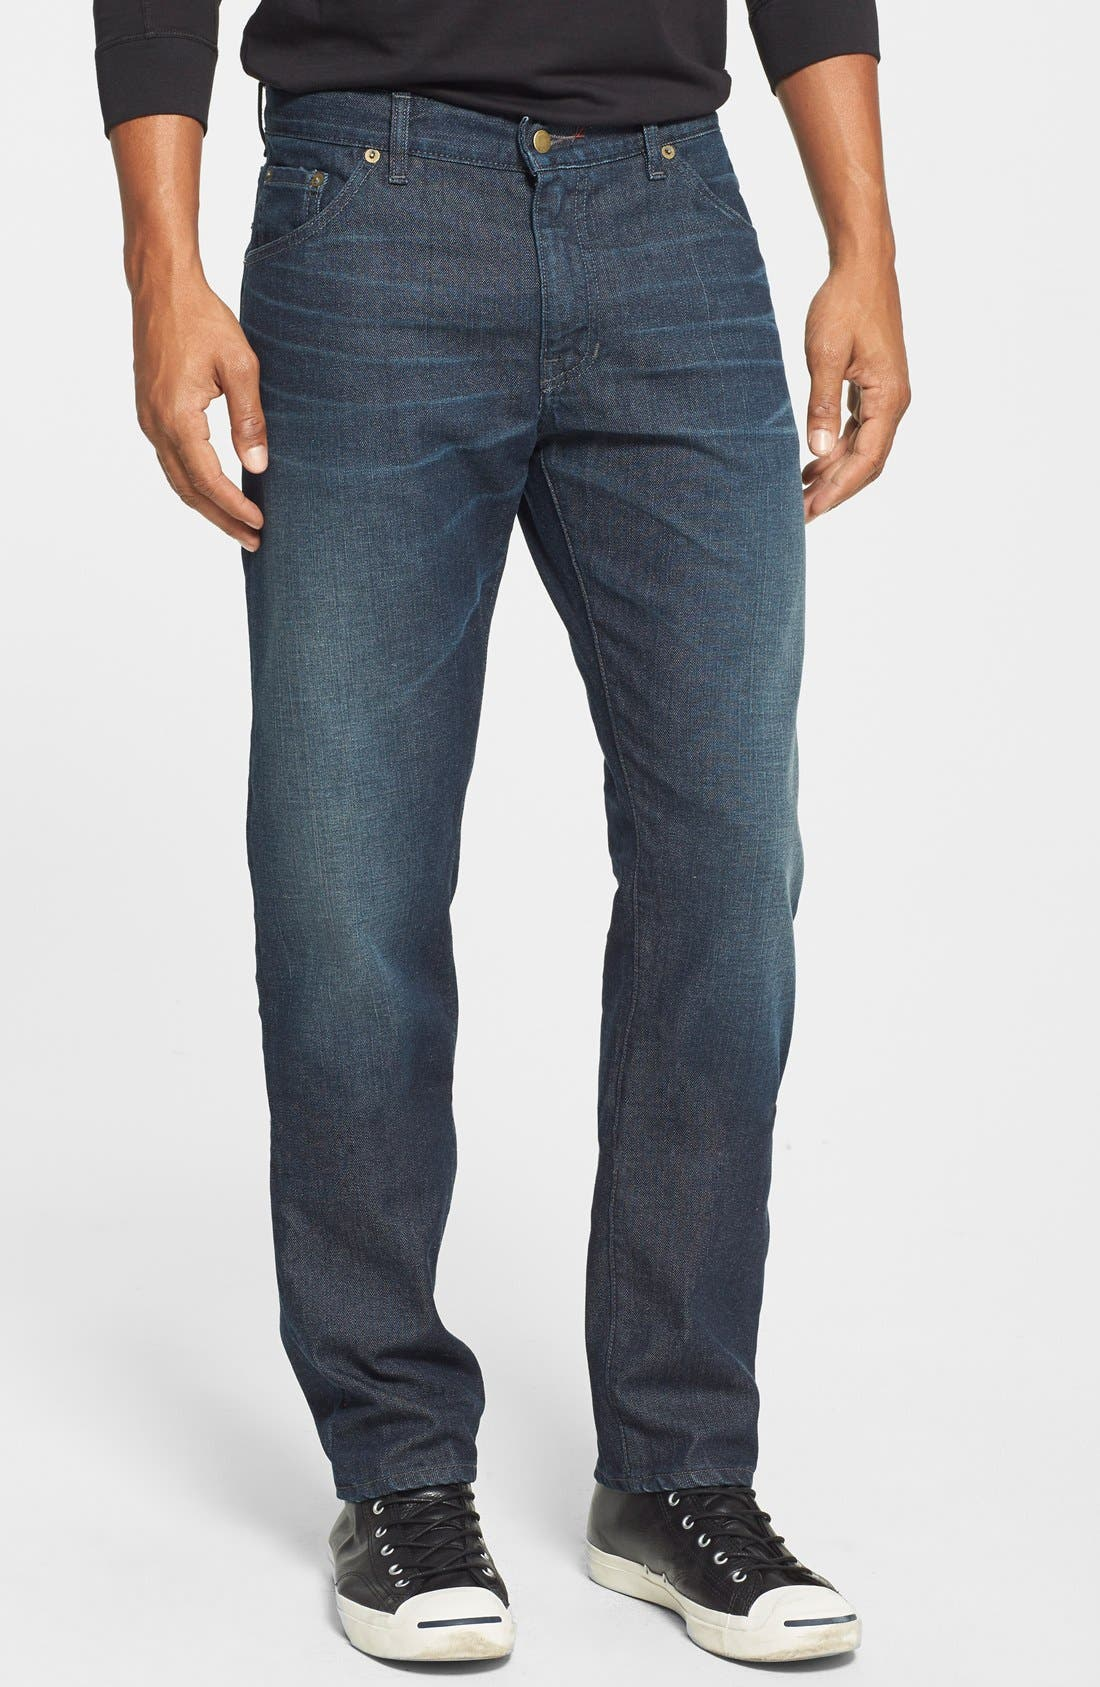 Raleigh Denim 'Martin' Slim Fit Jeans (Mason)